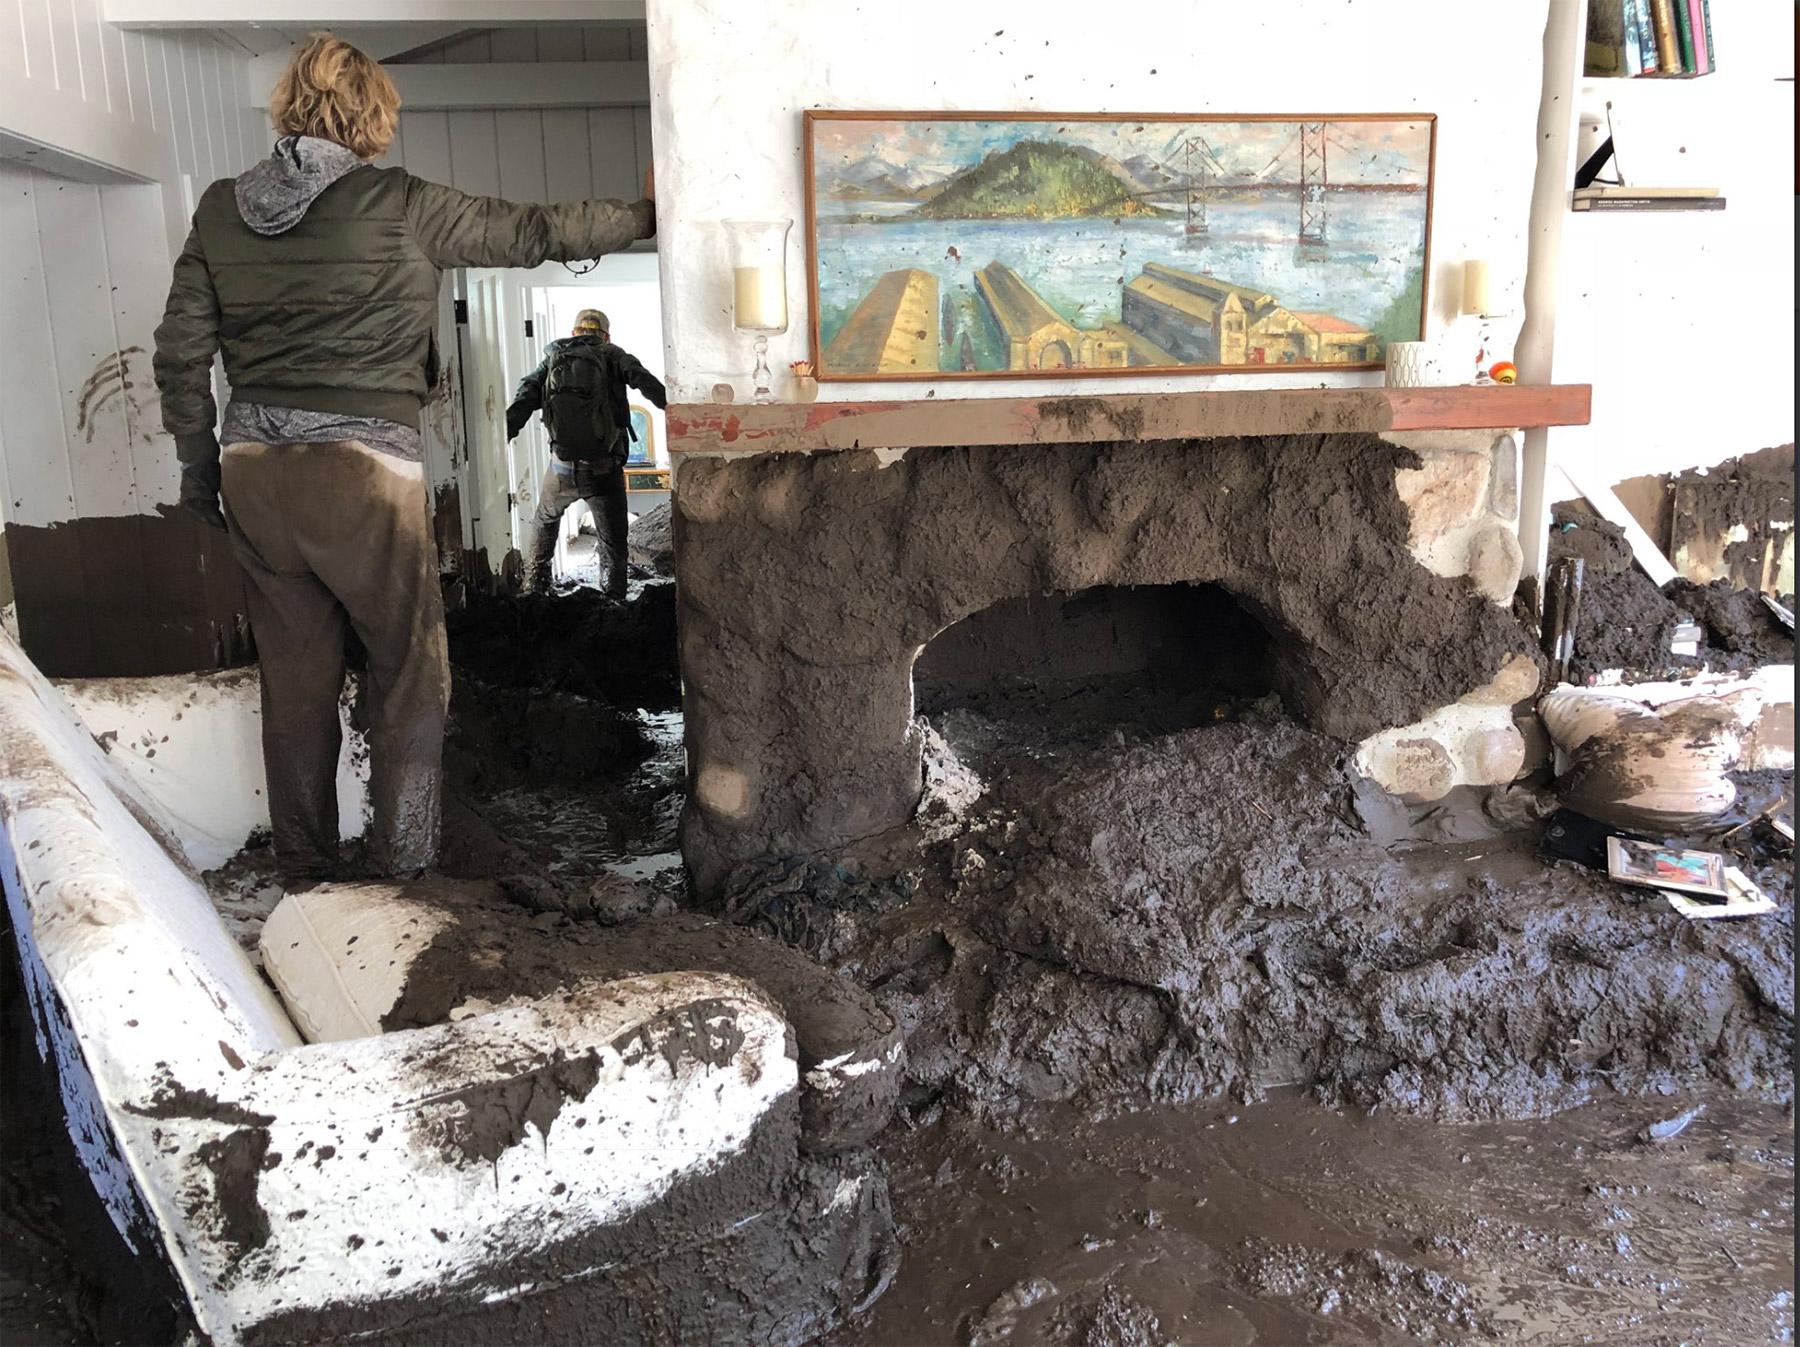 Stories Of Heroism Heartbreak Emerge From Montecito Mudslides